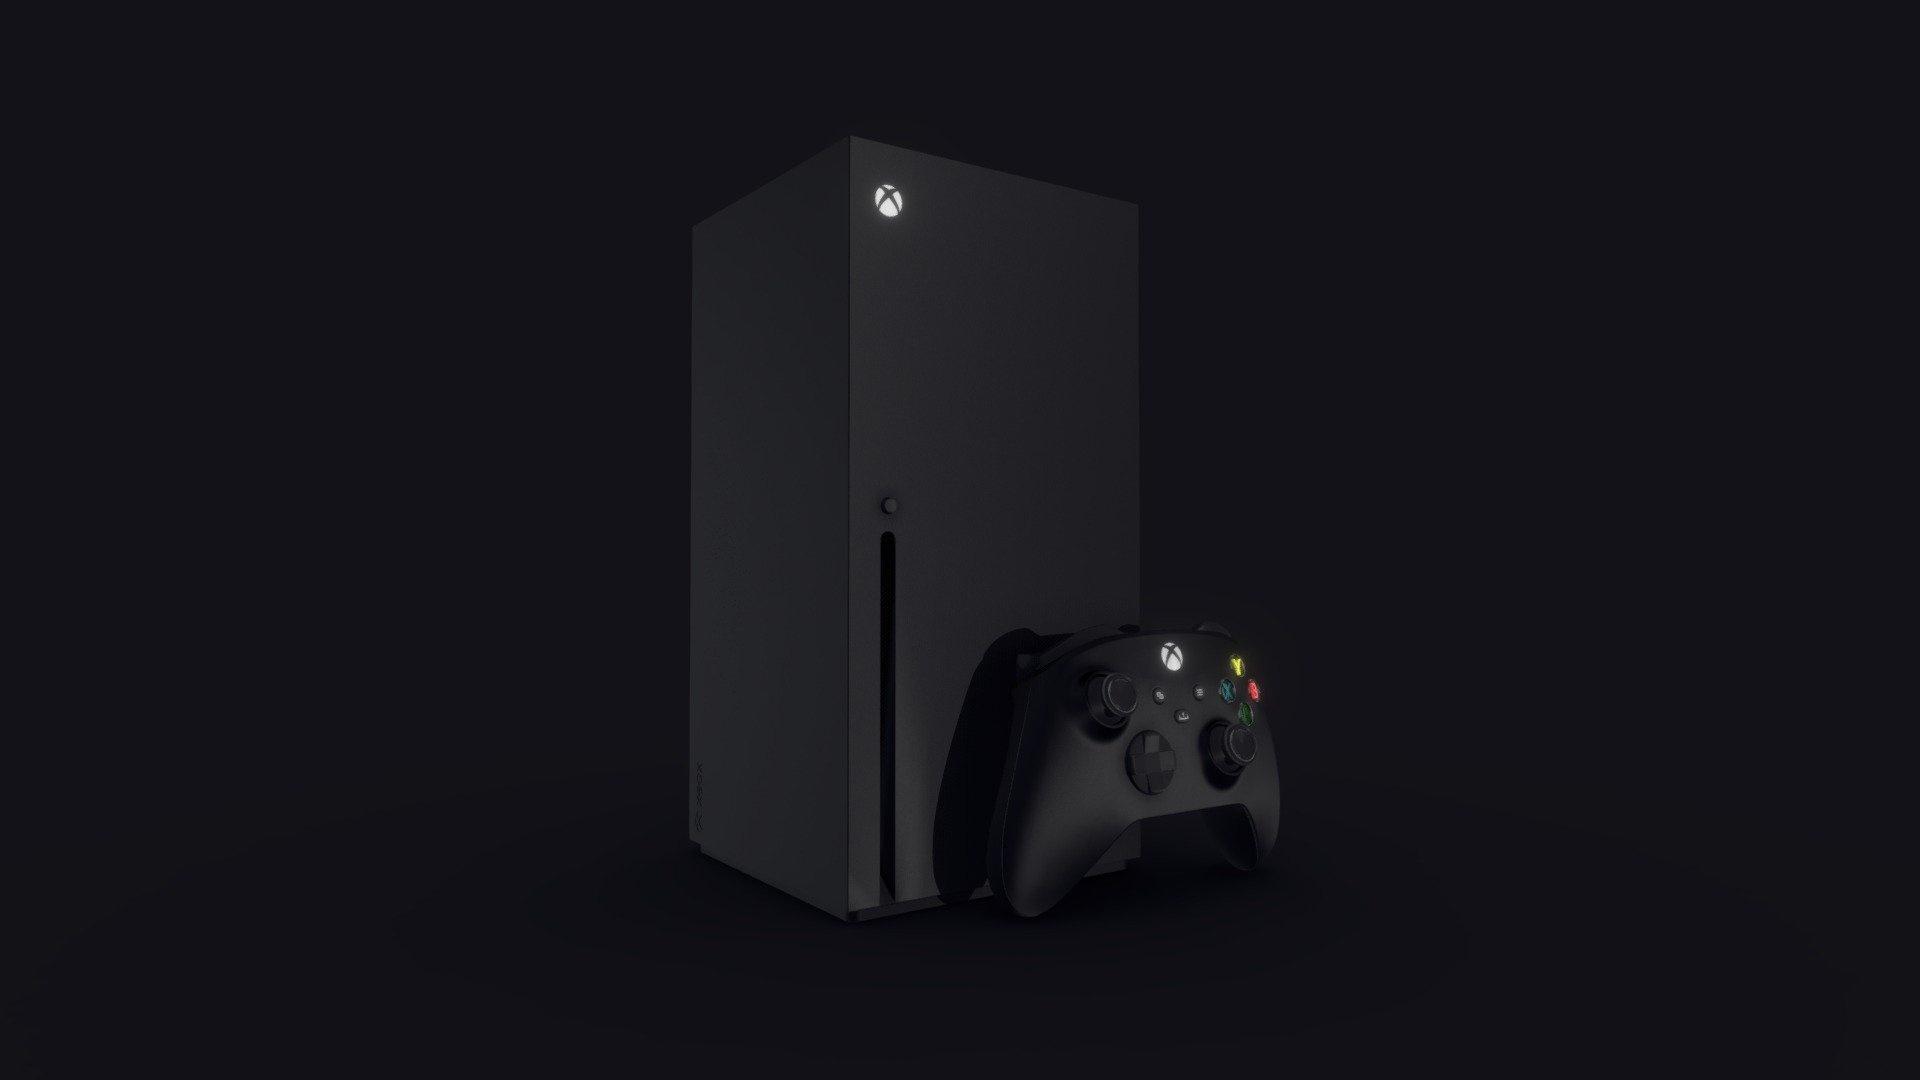 Xbox Series hd wallpaper download